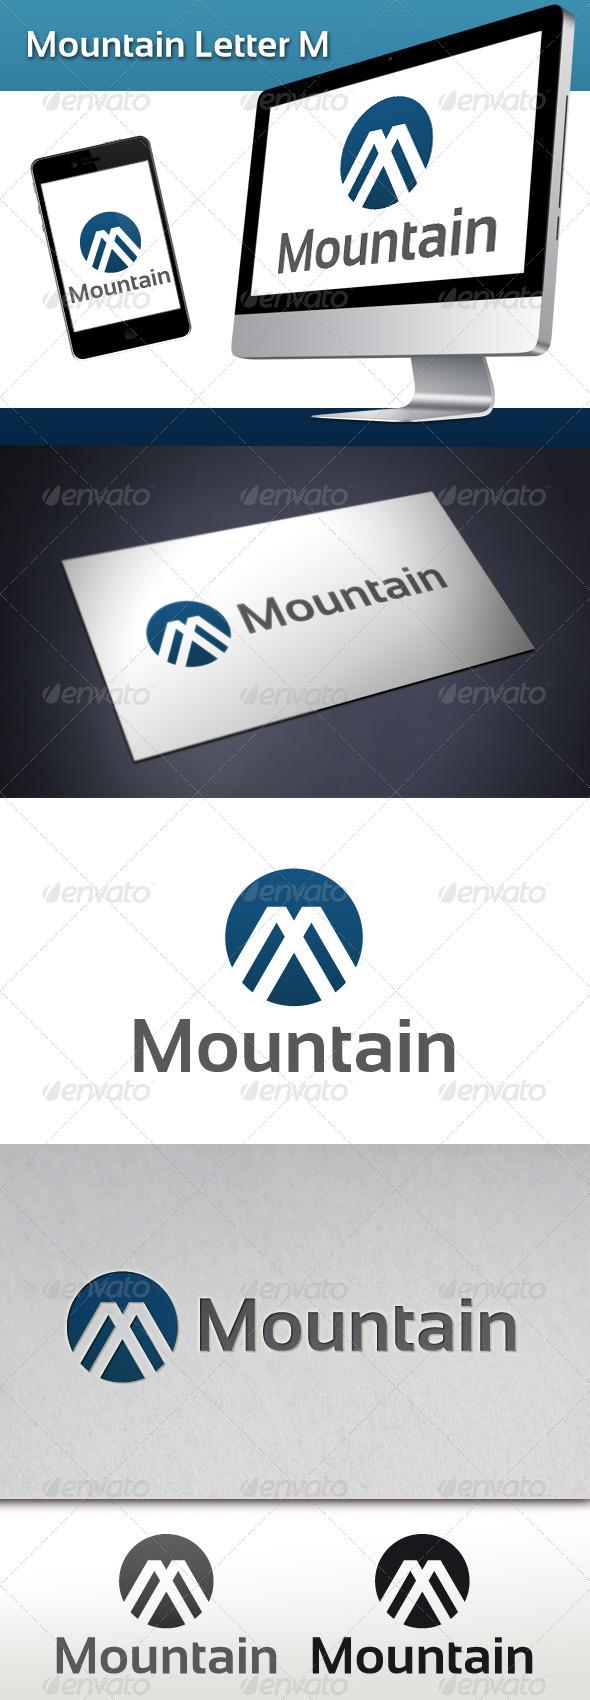 GraphicRiver Mountain Letter M Logo 3507261